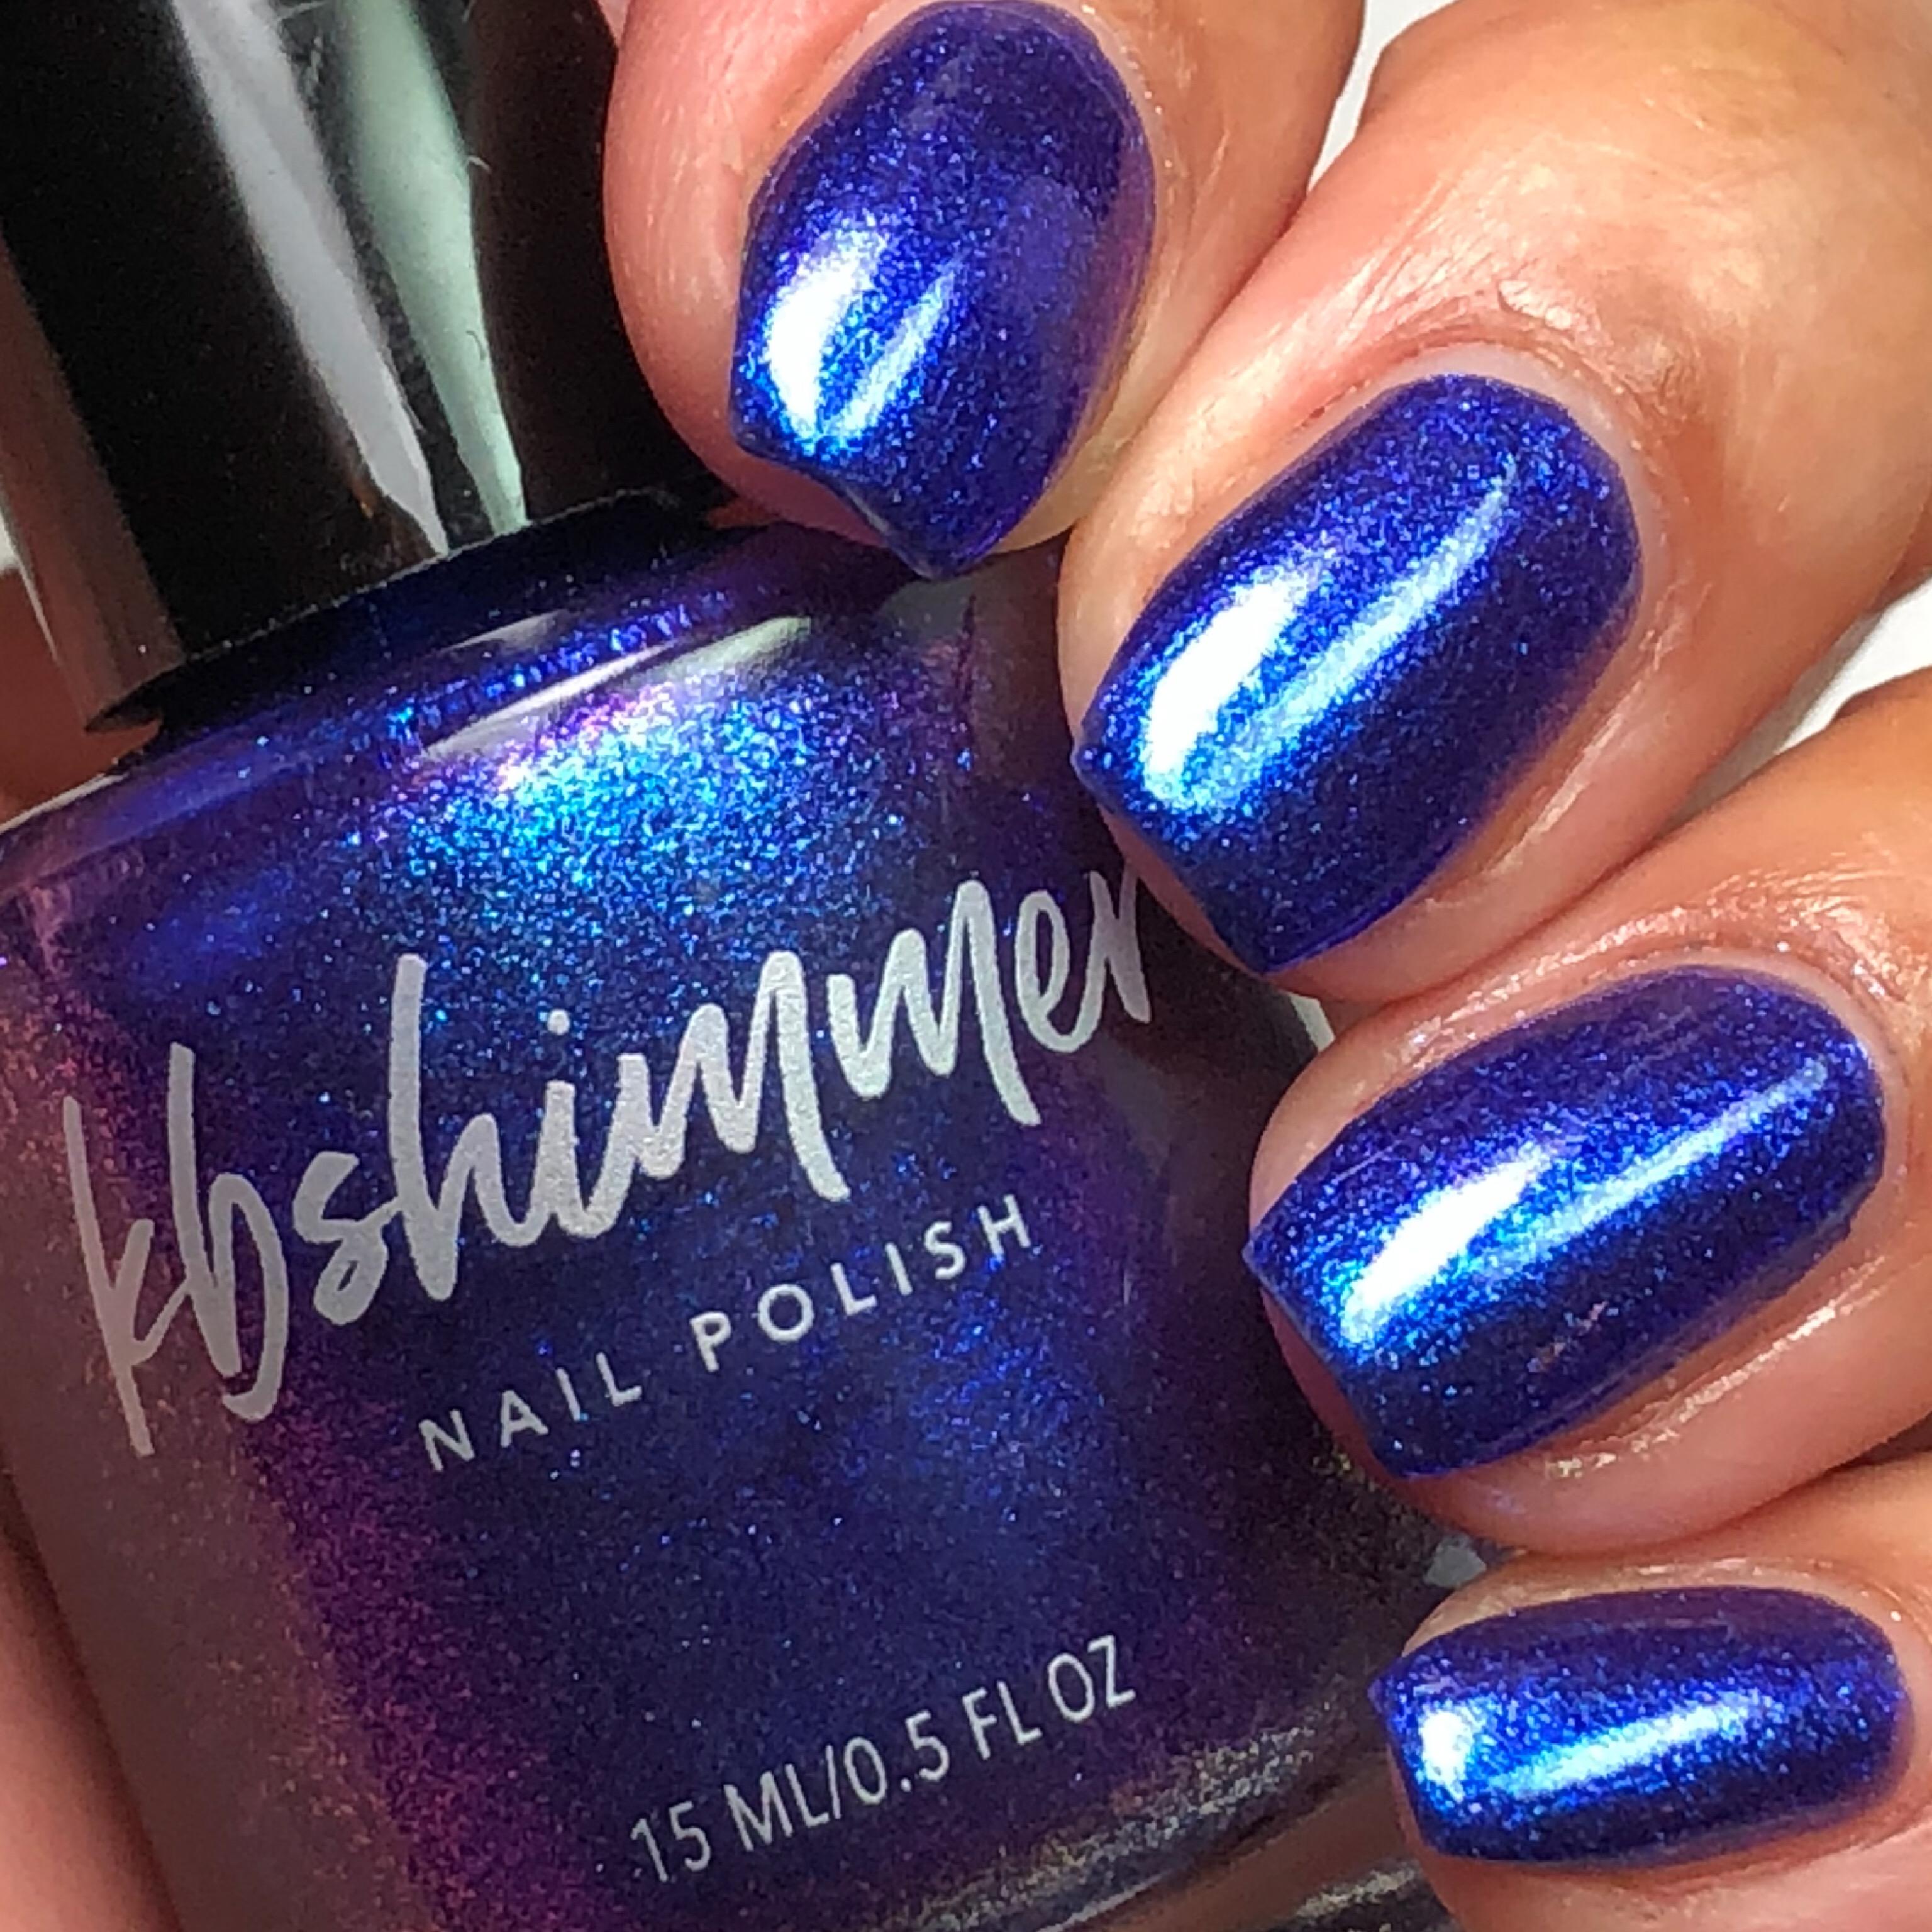 KBShimmer Royal To A Fault Holographic Nail Polish